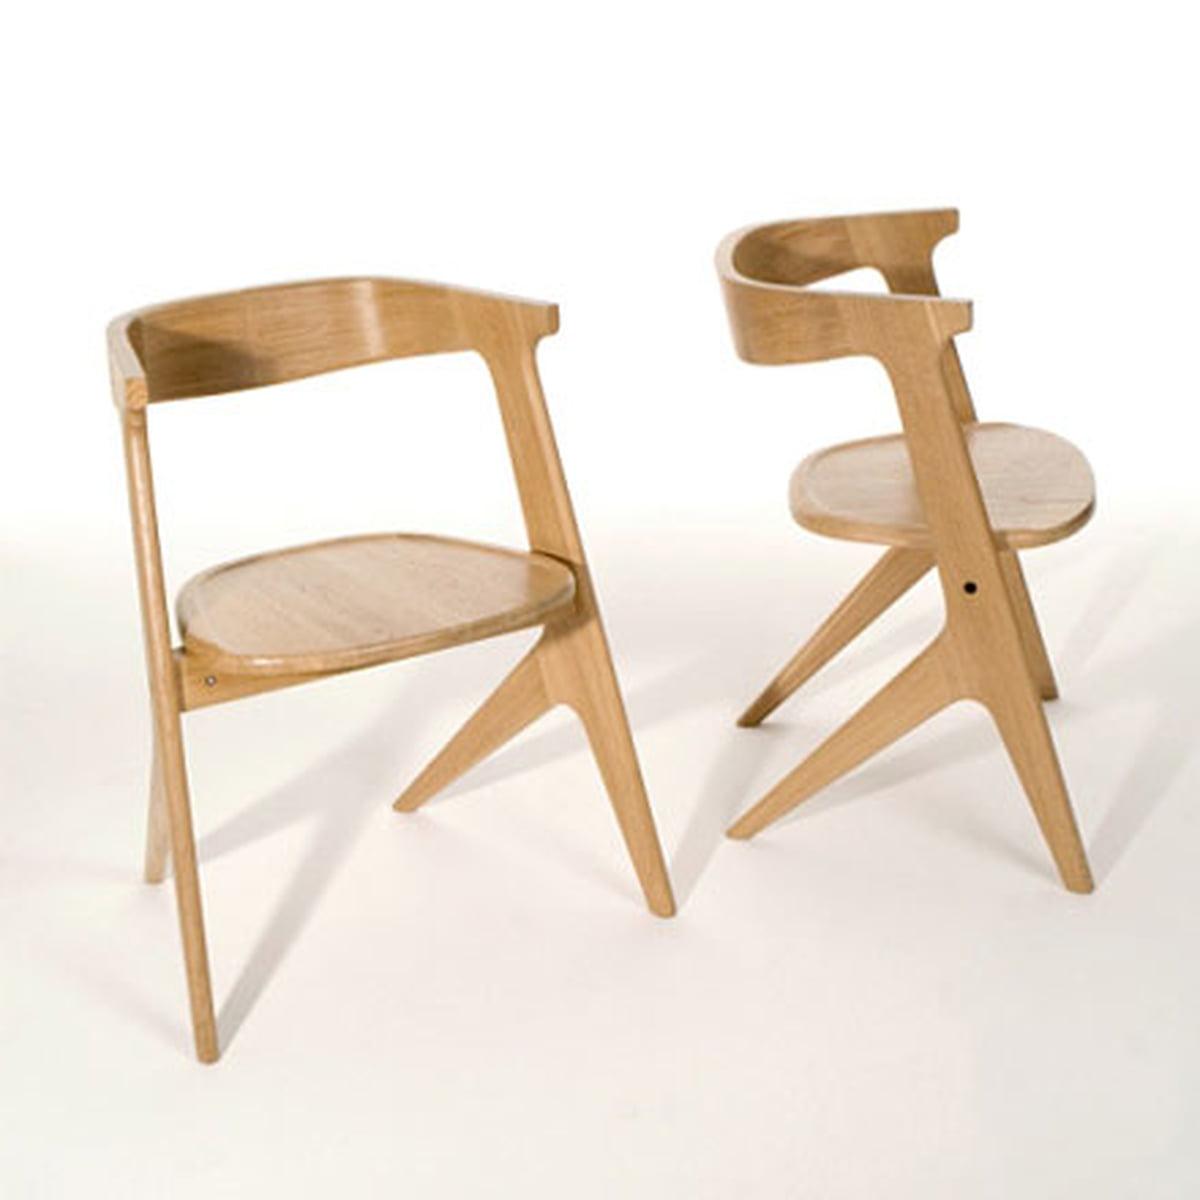 slab chair tom dixon shop